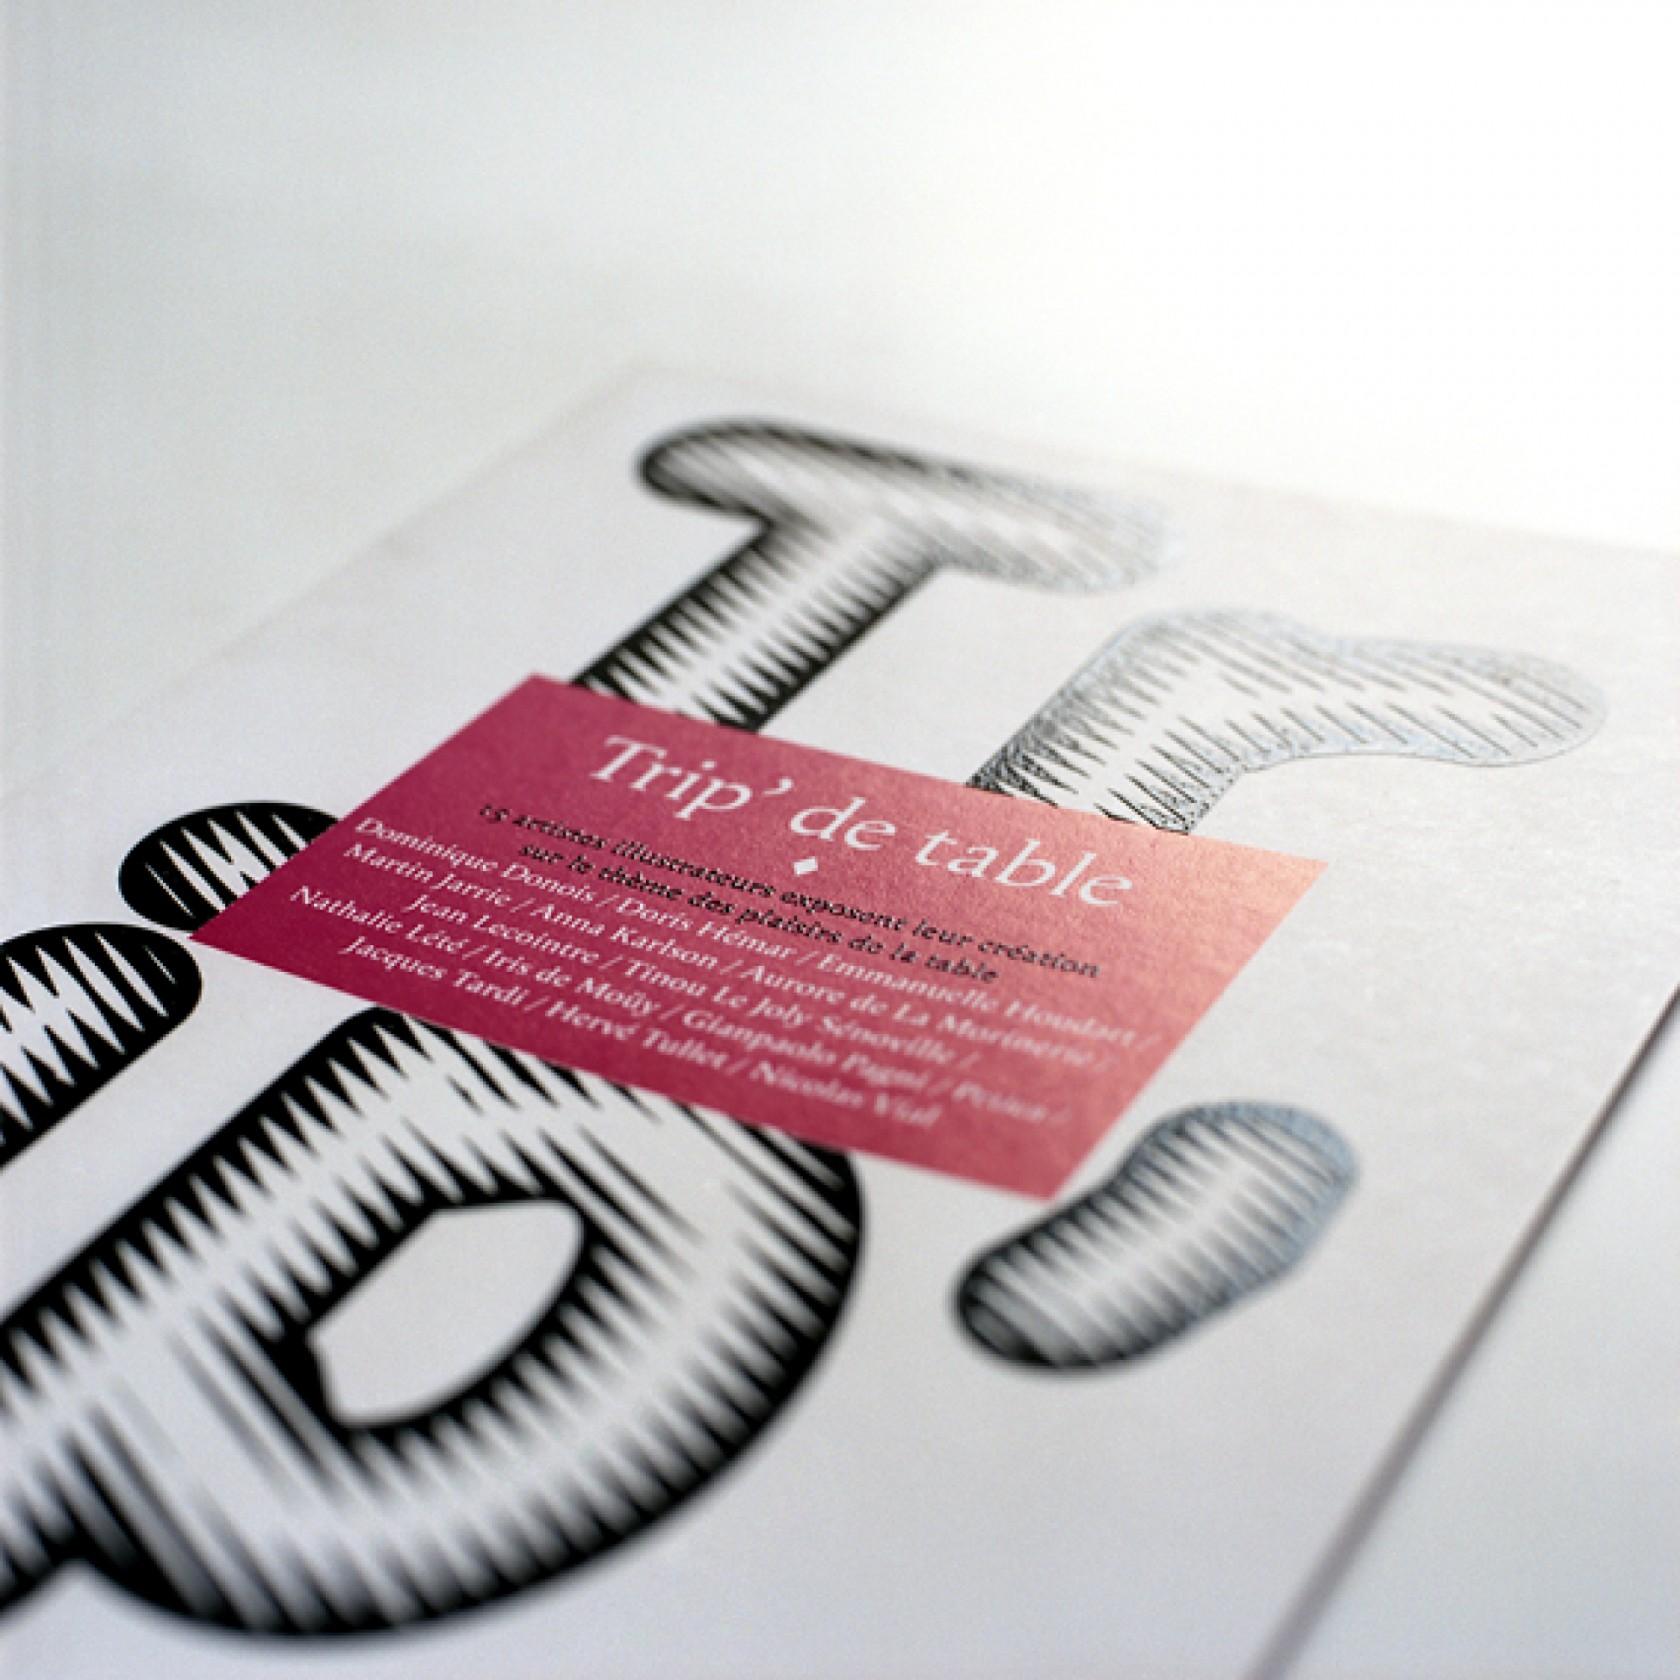 fouinzanardi -  fz_print_rp_com_produitstripiers4